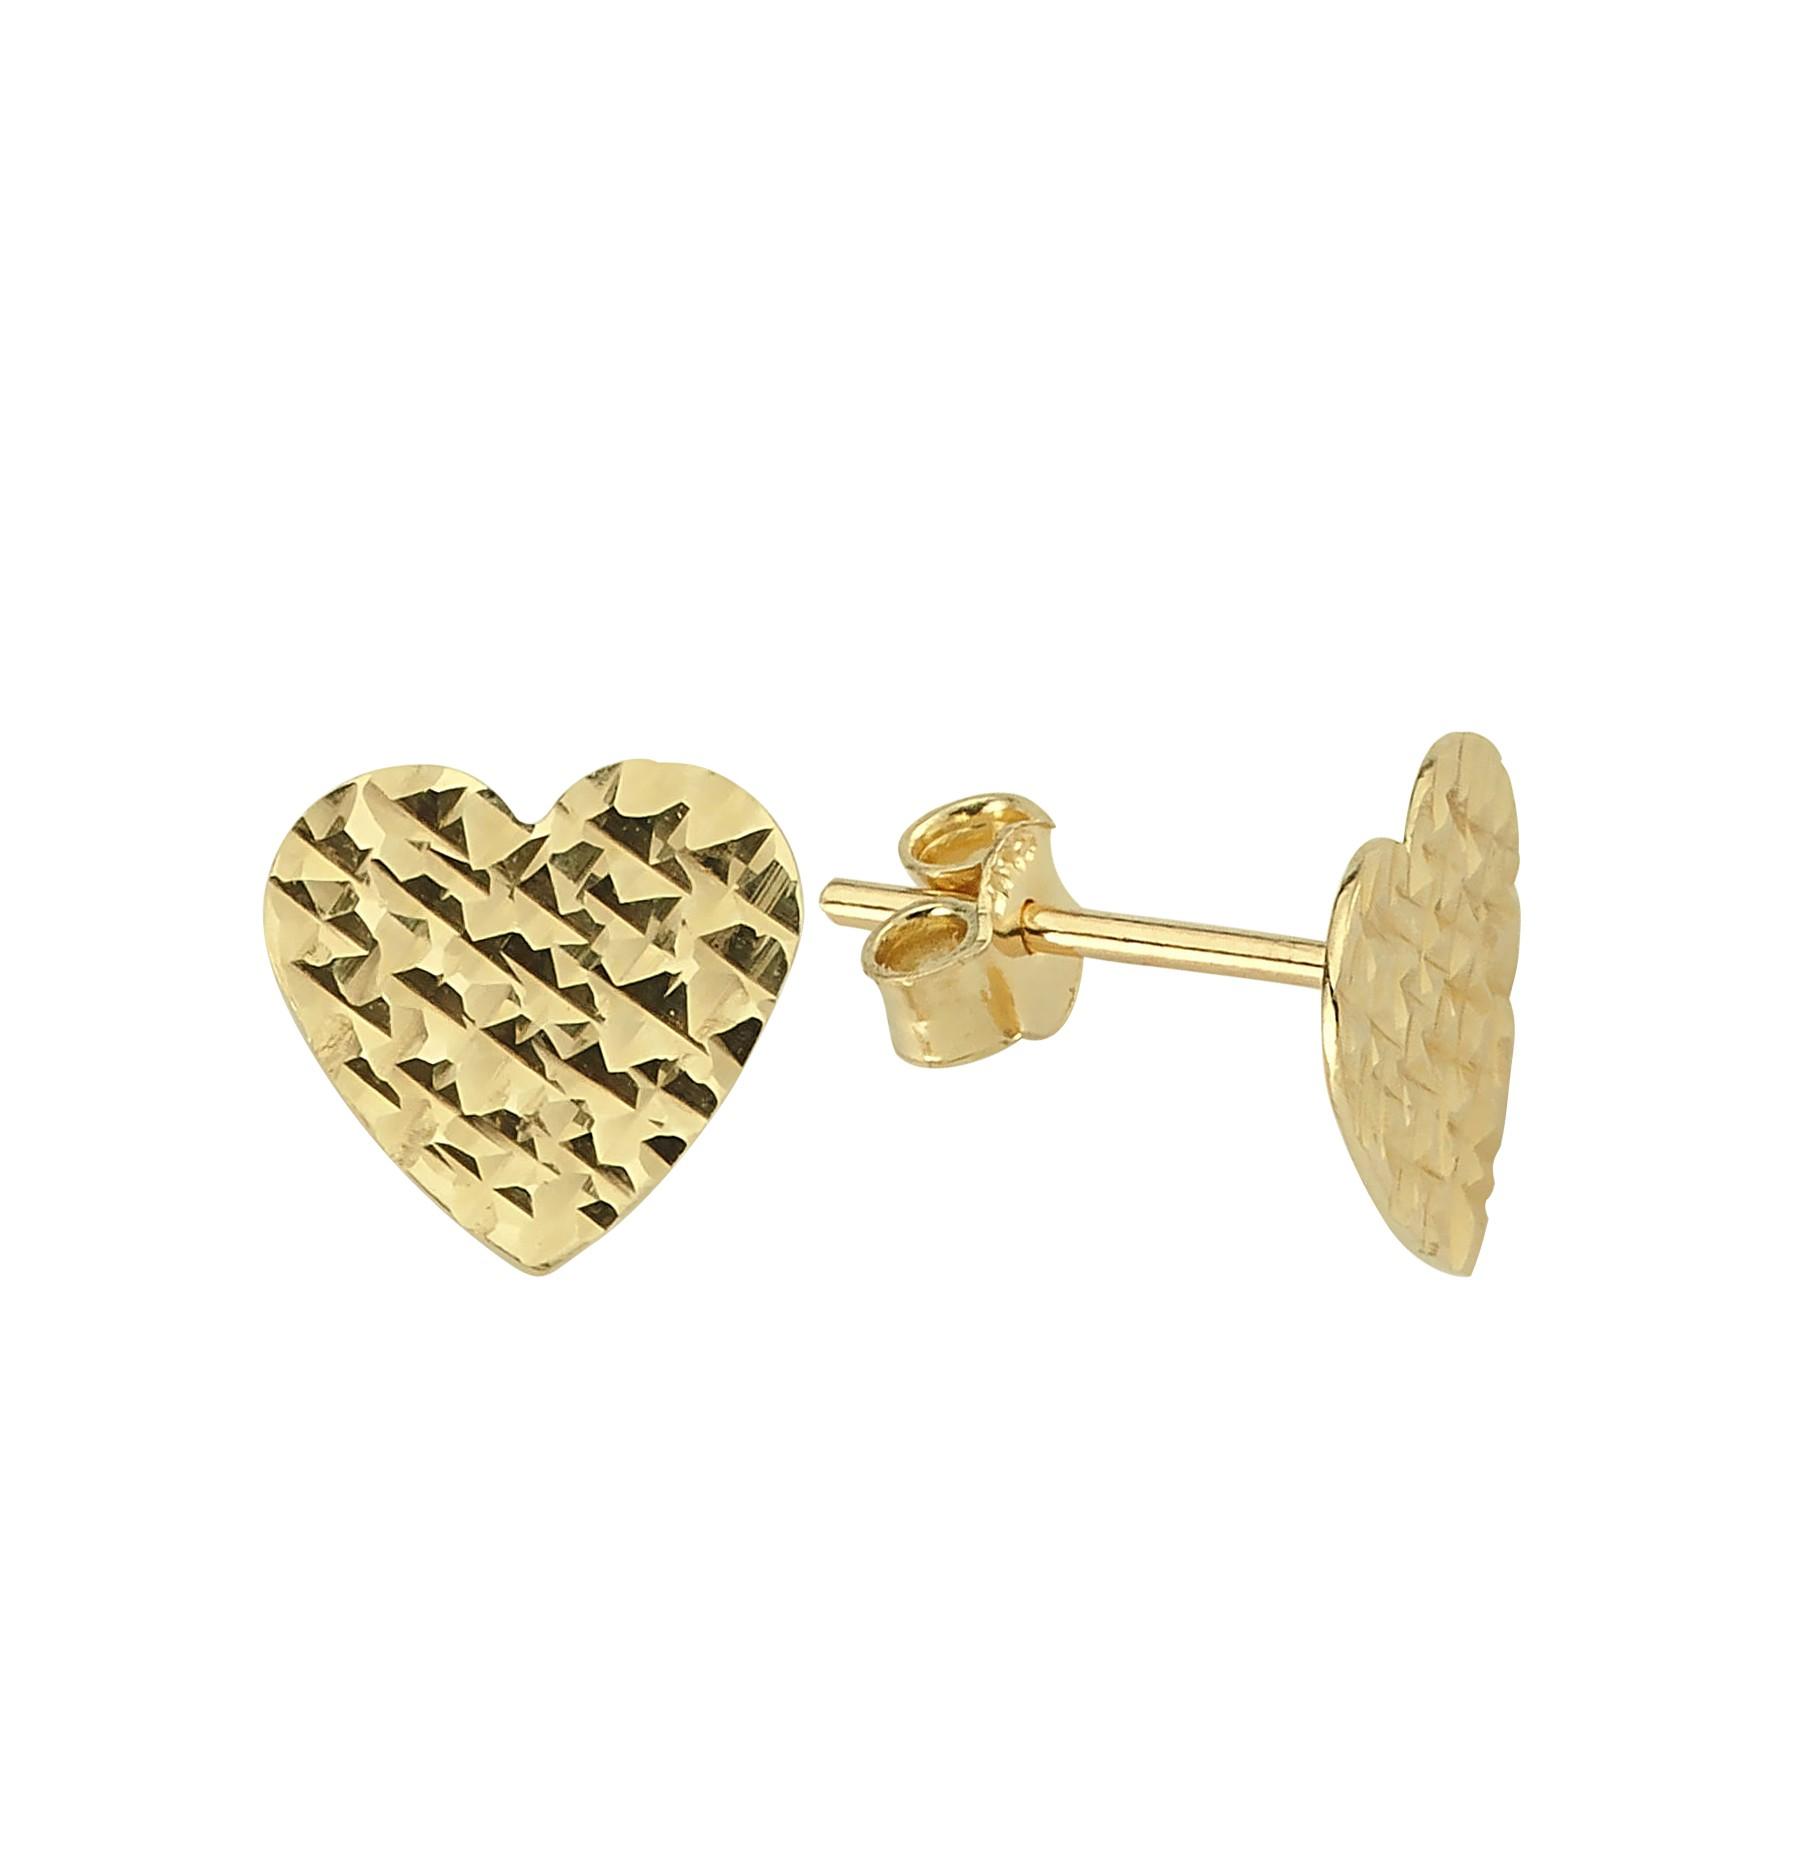 585 Kocak Gold Ohrring  |  Herz